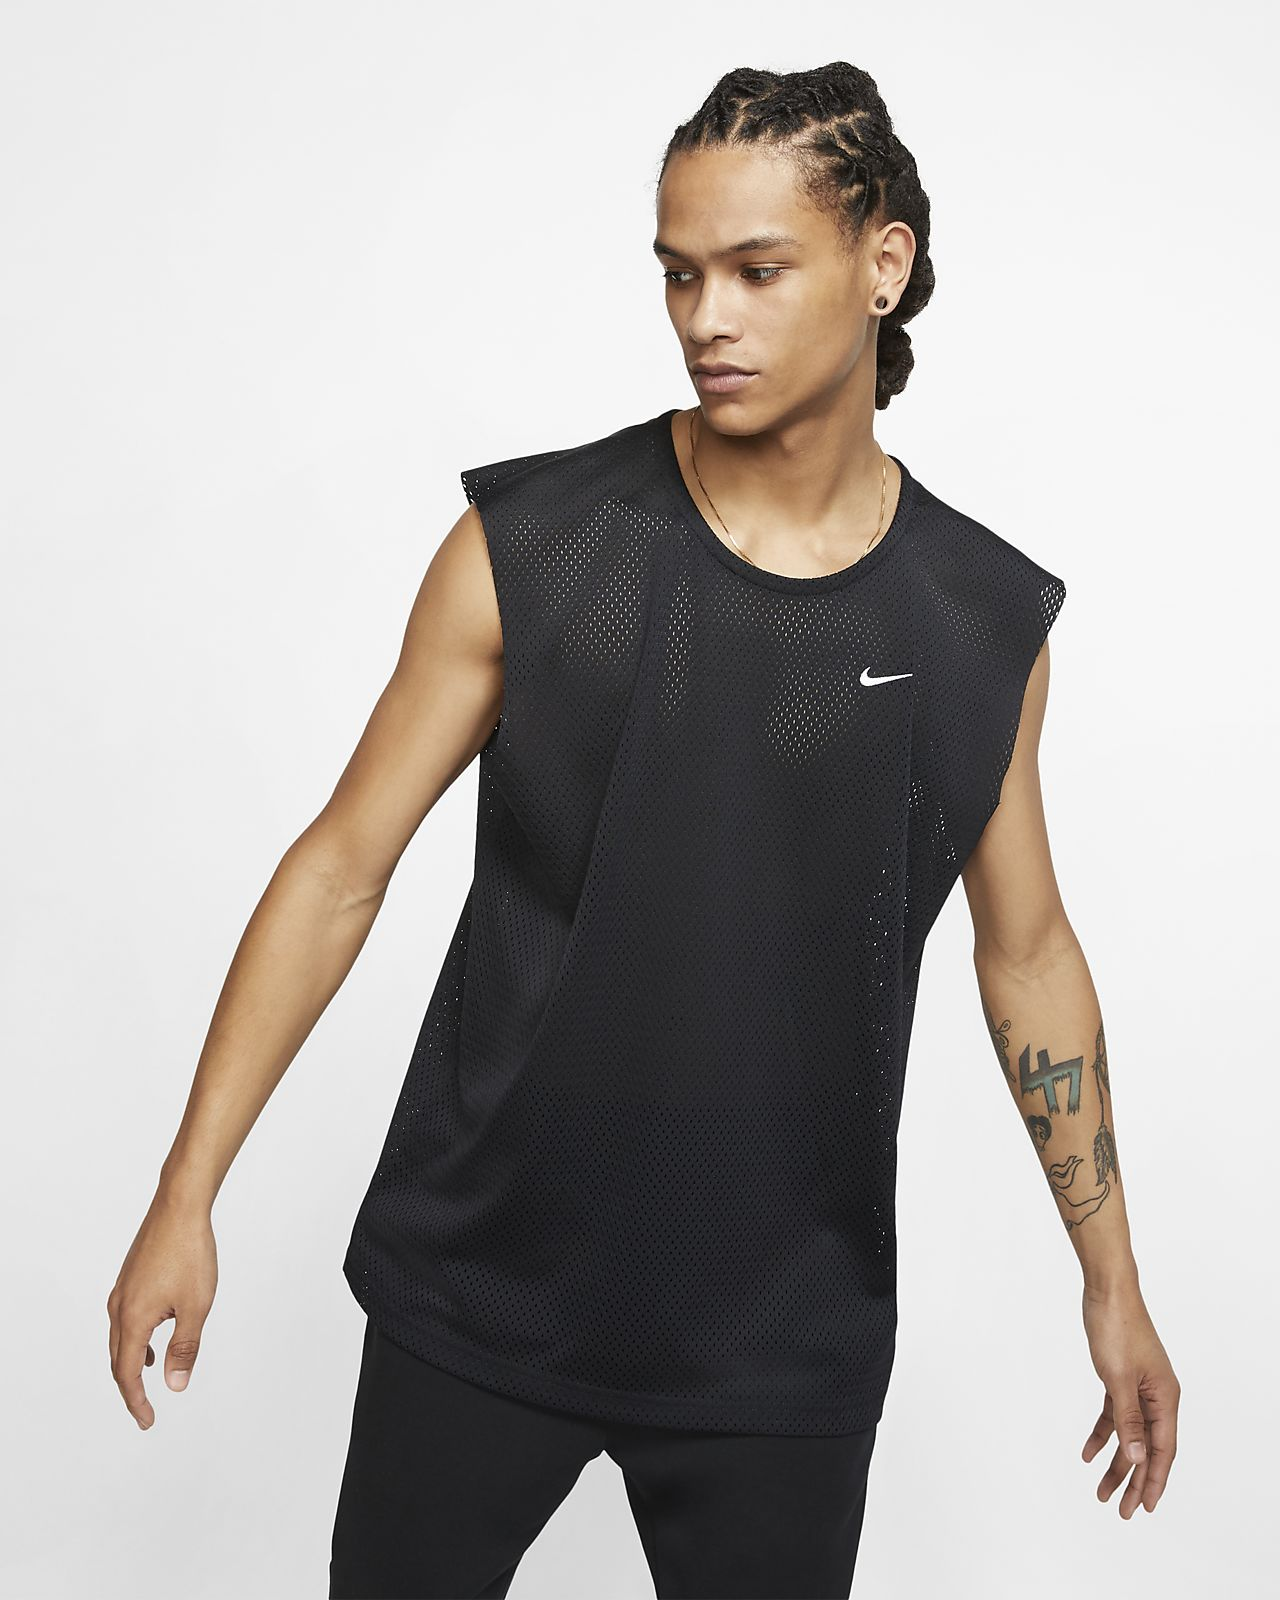 NikeLab Collection 男款背心